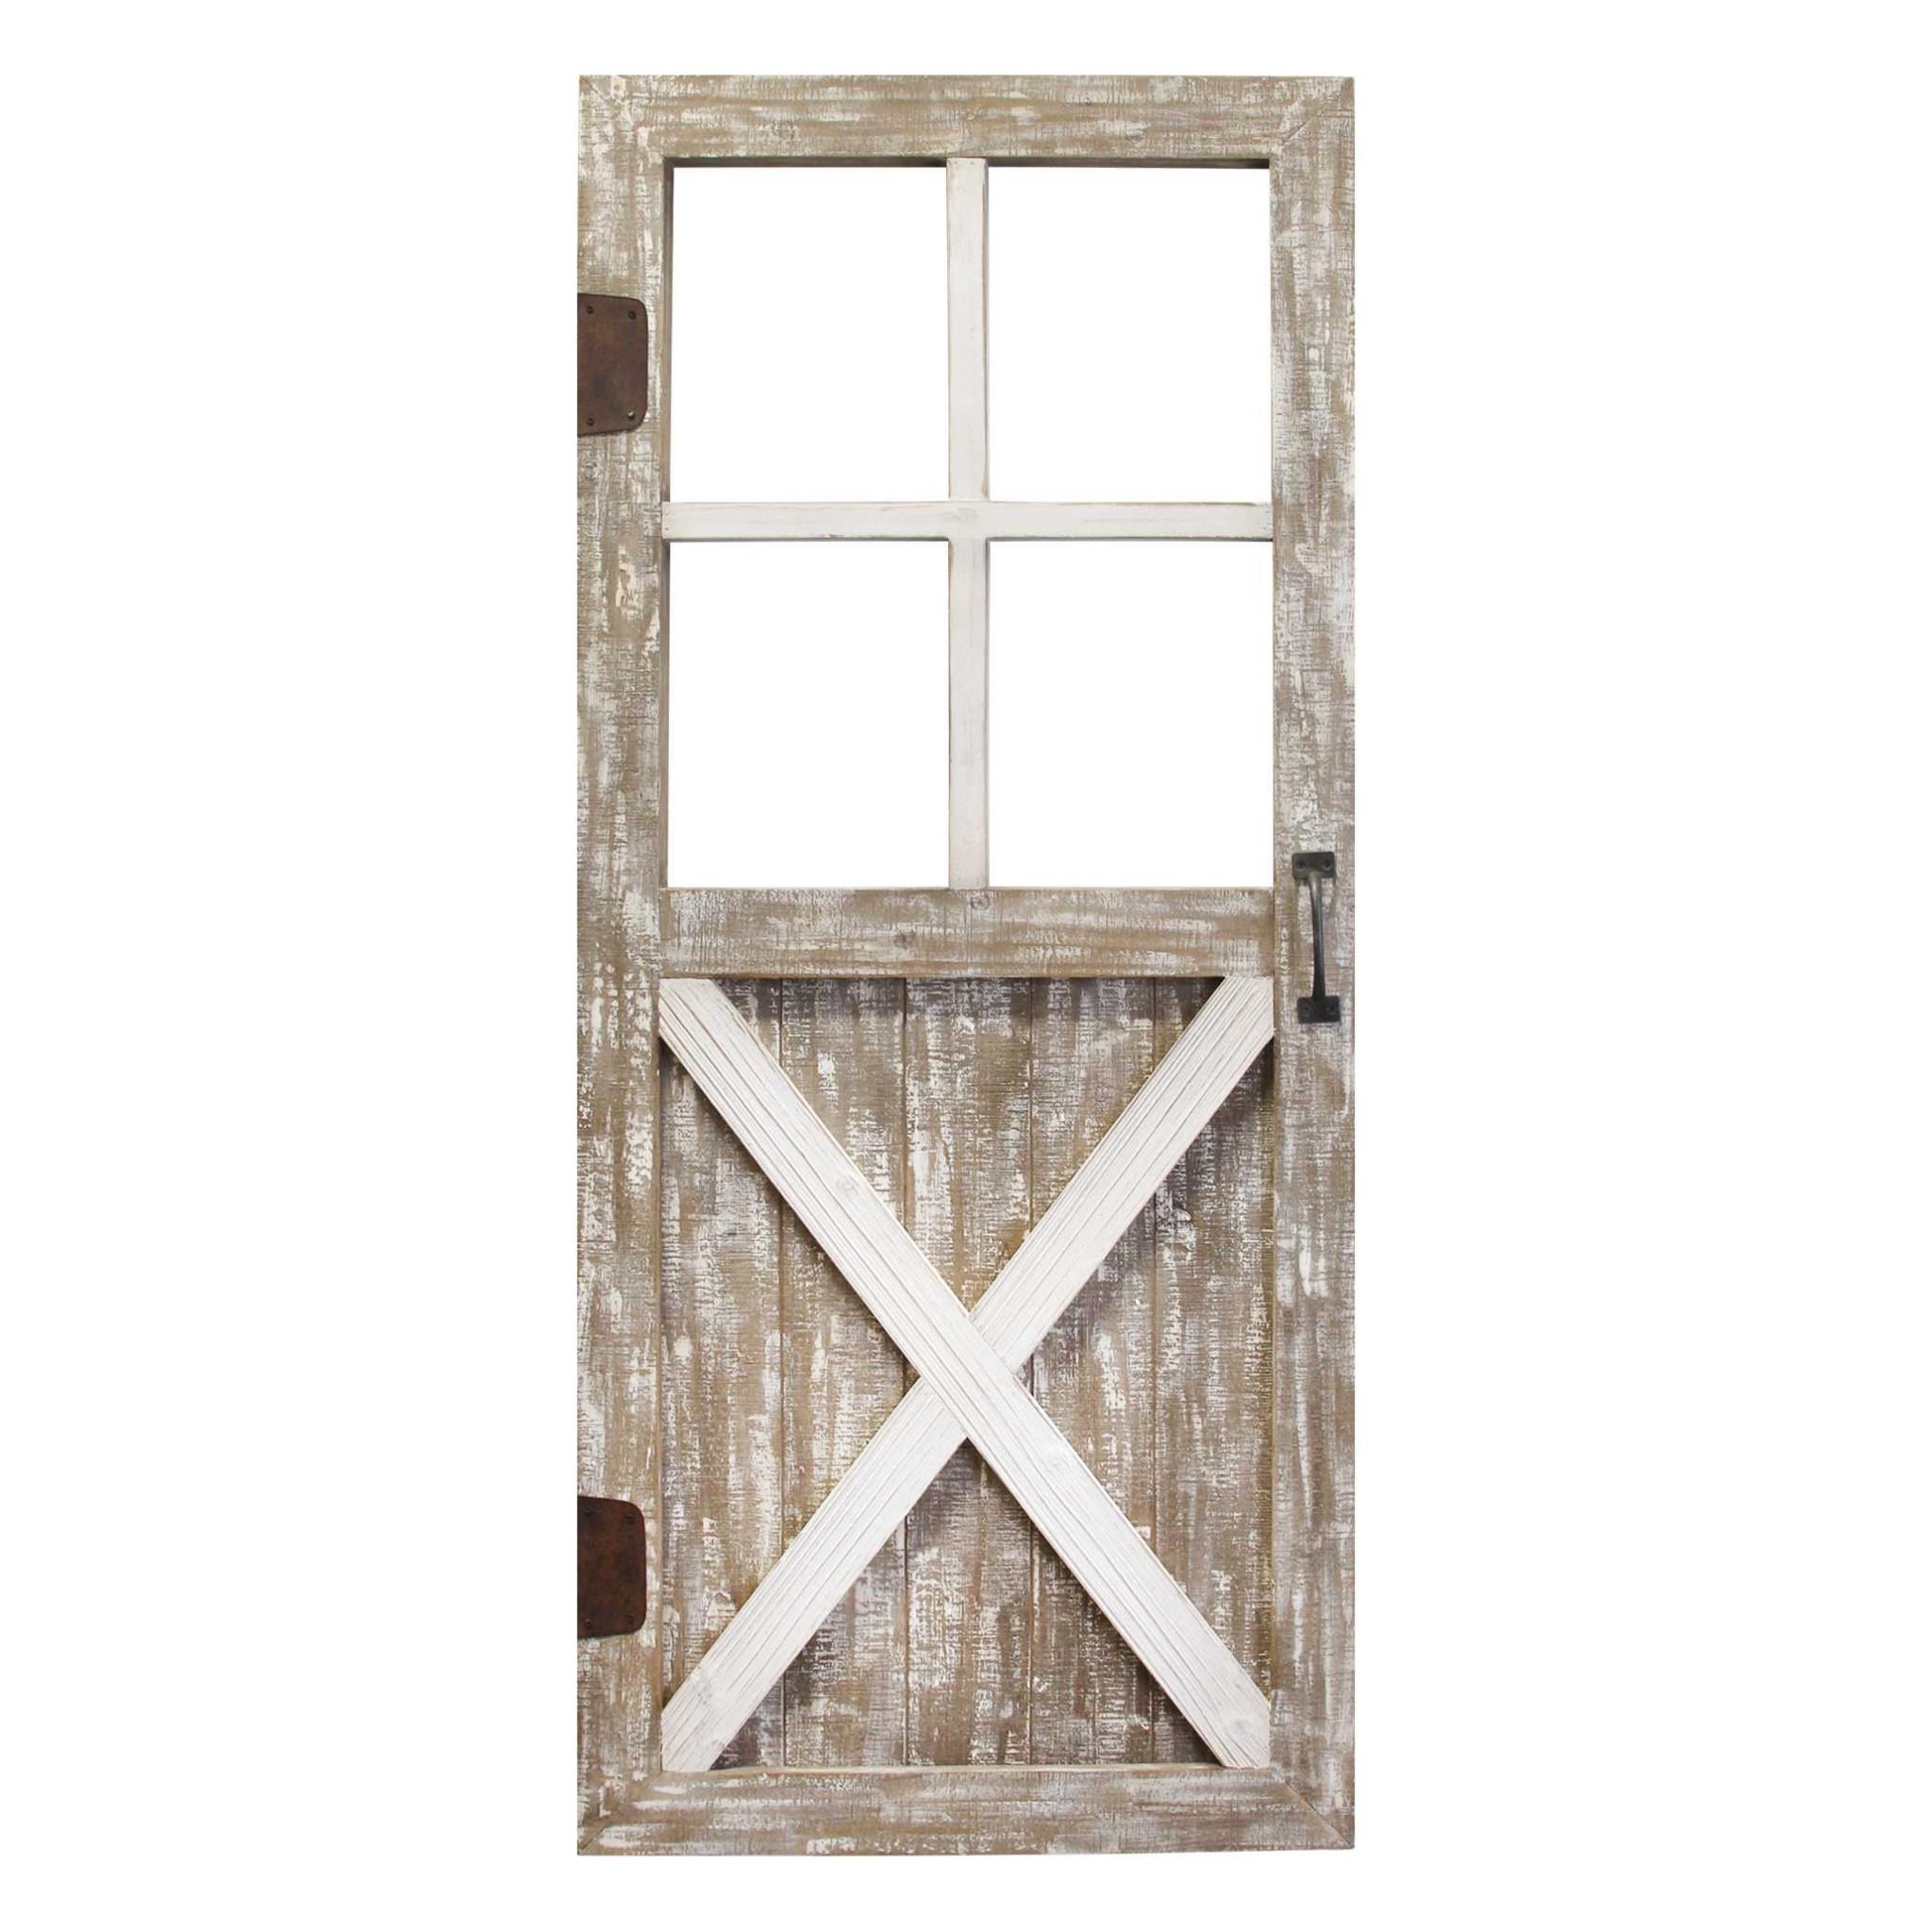 Distressed Wood Framed Barn Door Home Decor